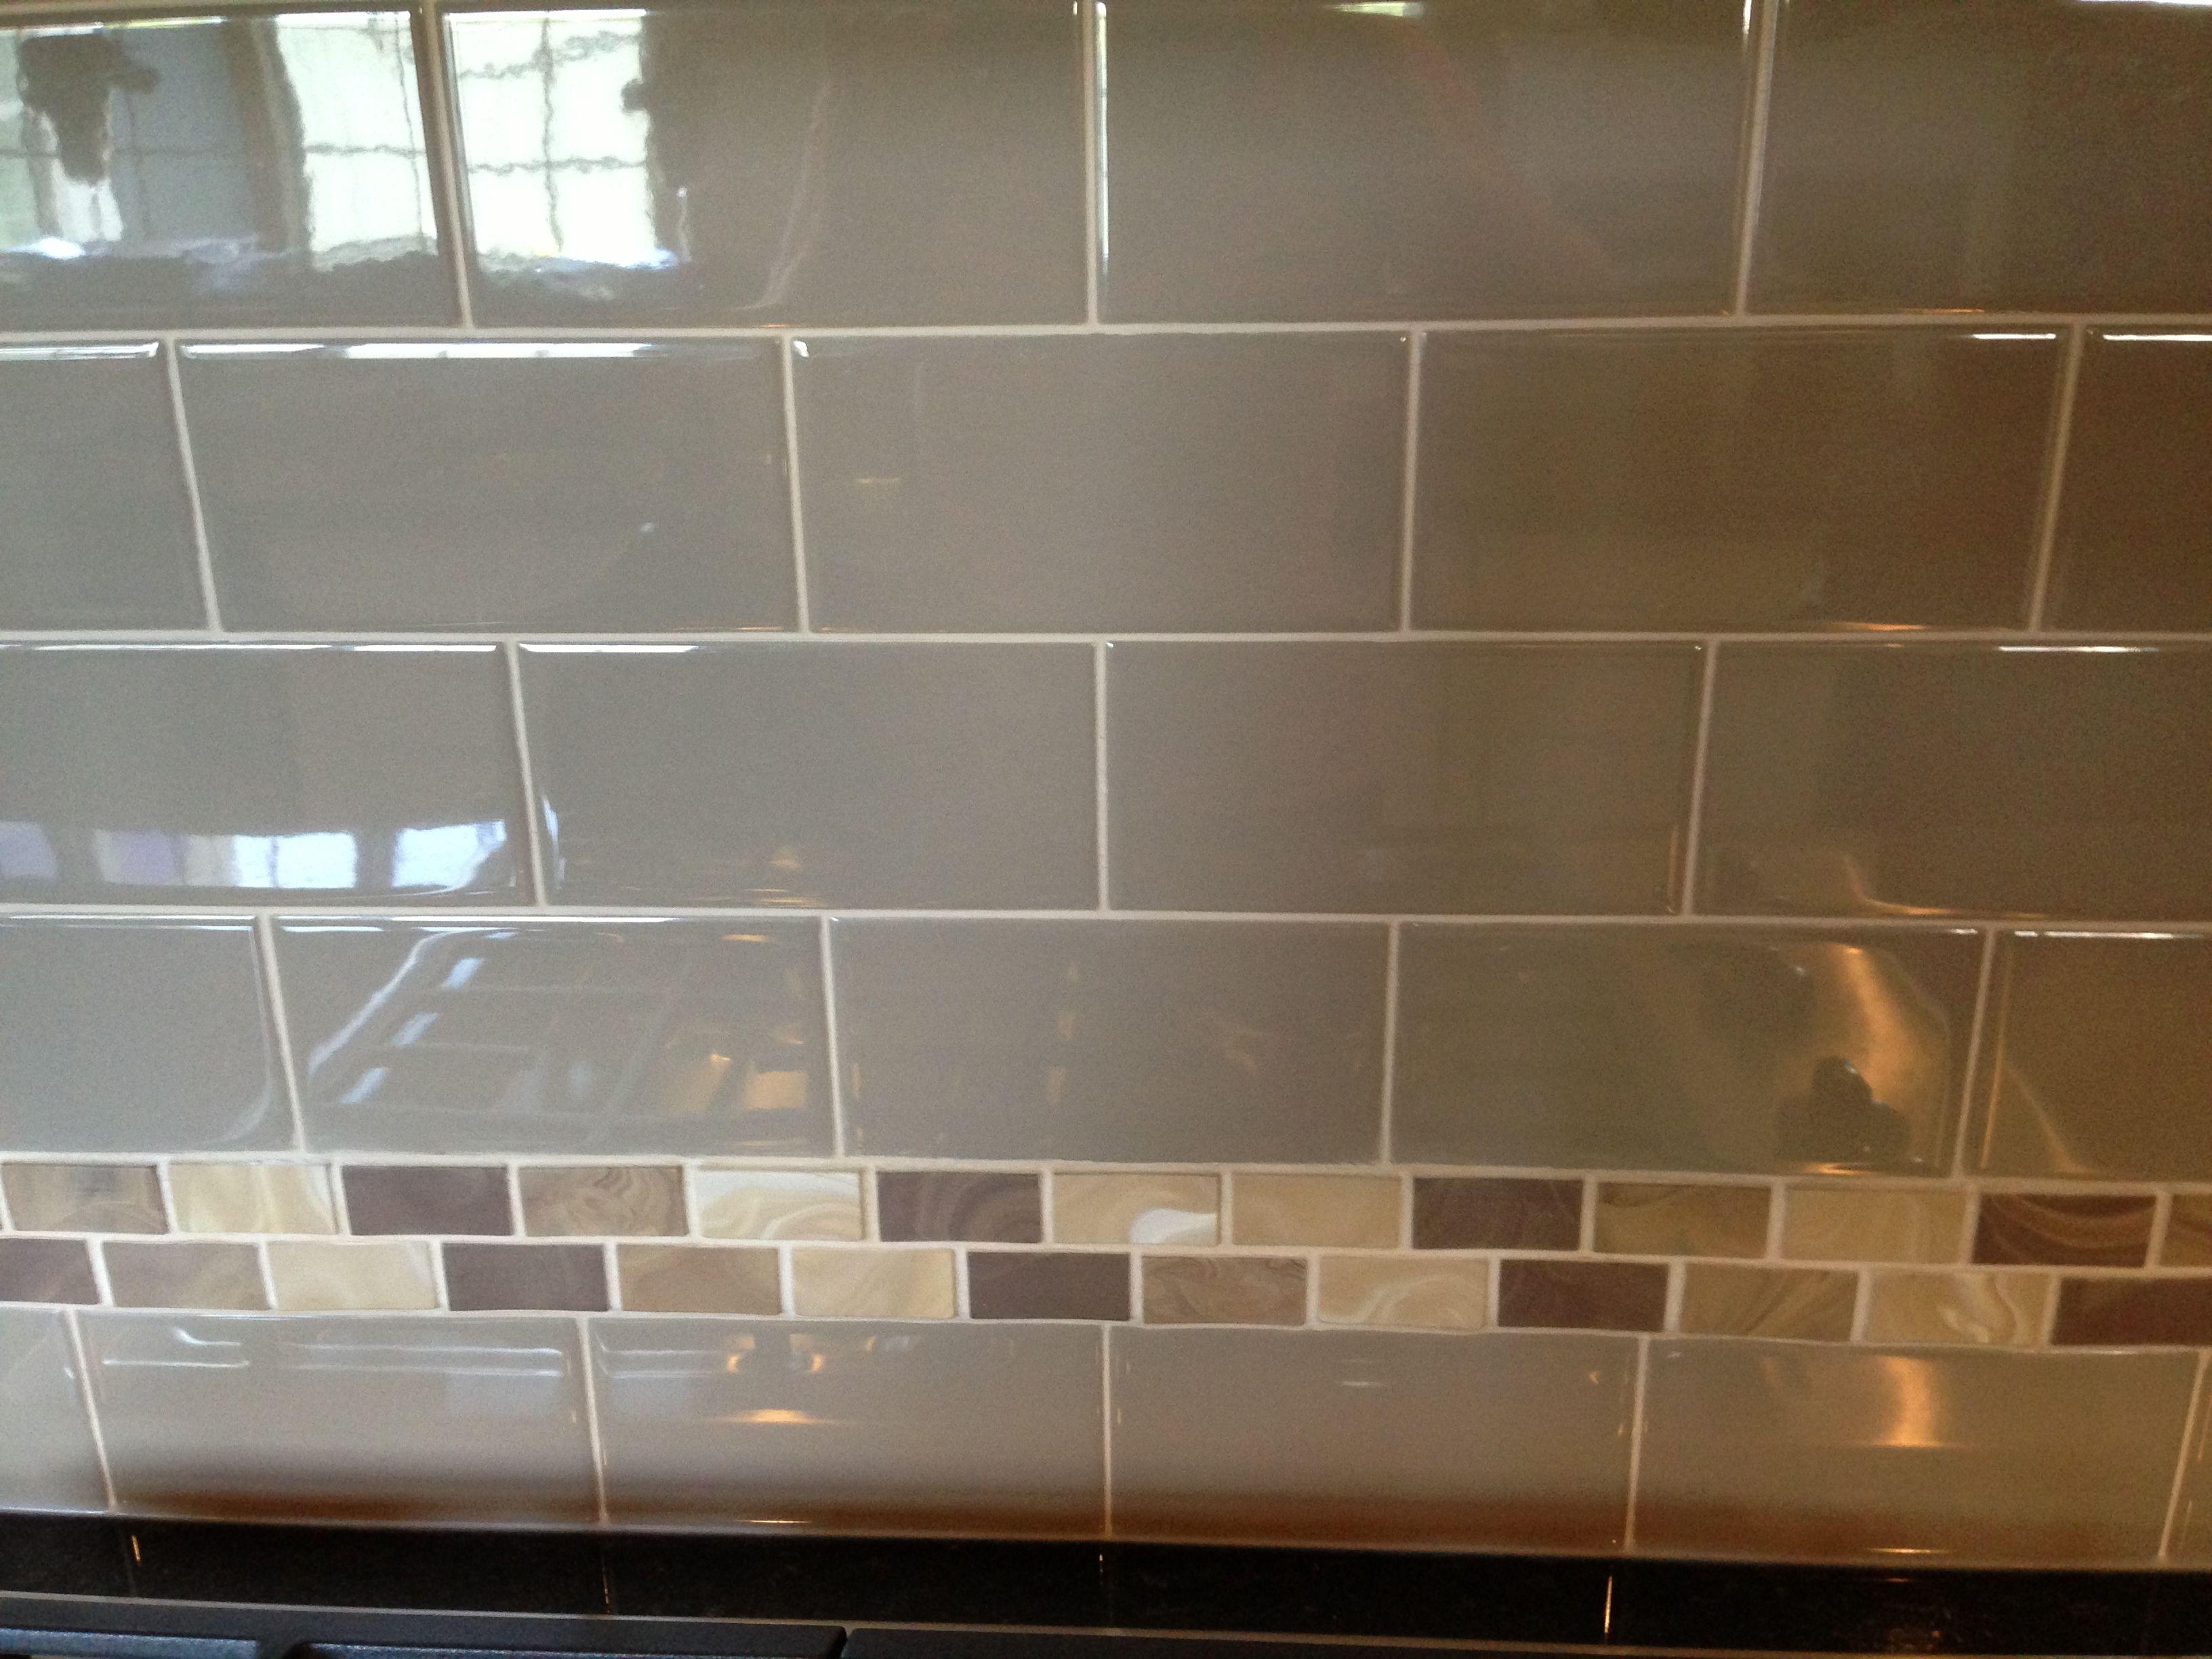 - Kitchen Backsplash, Subway Tile With Border Kitchen Backsplash